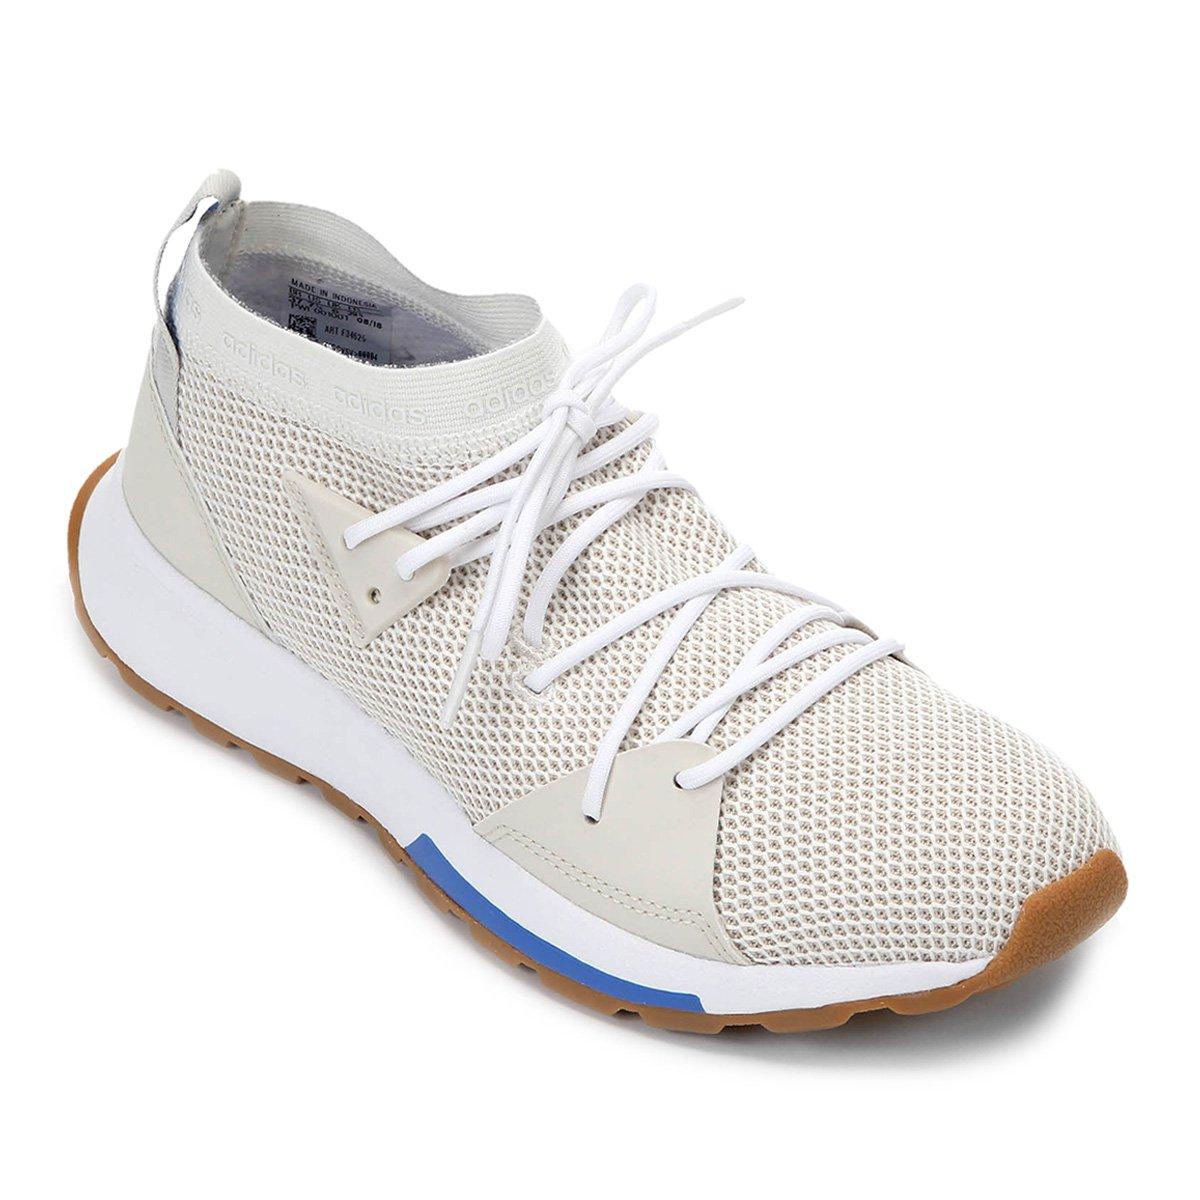 b3b518bedf3 Tênis Adidas Quesa Feminino - Cinza e Azul - Compre Agora